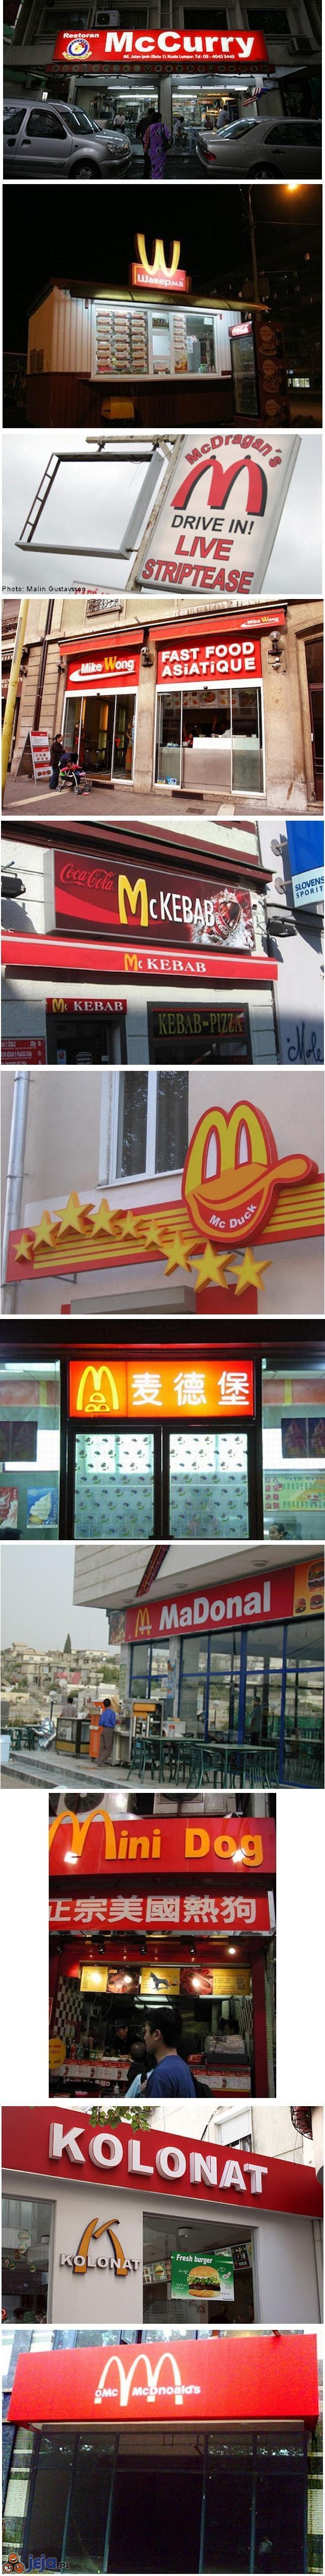 Podróbki McDonalda